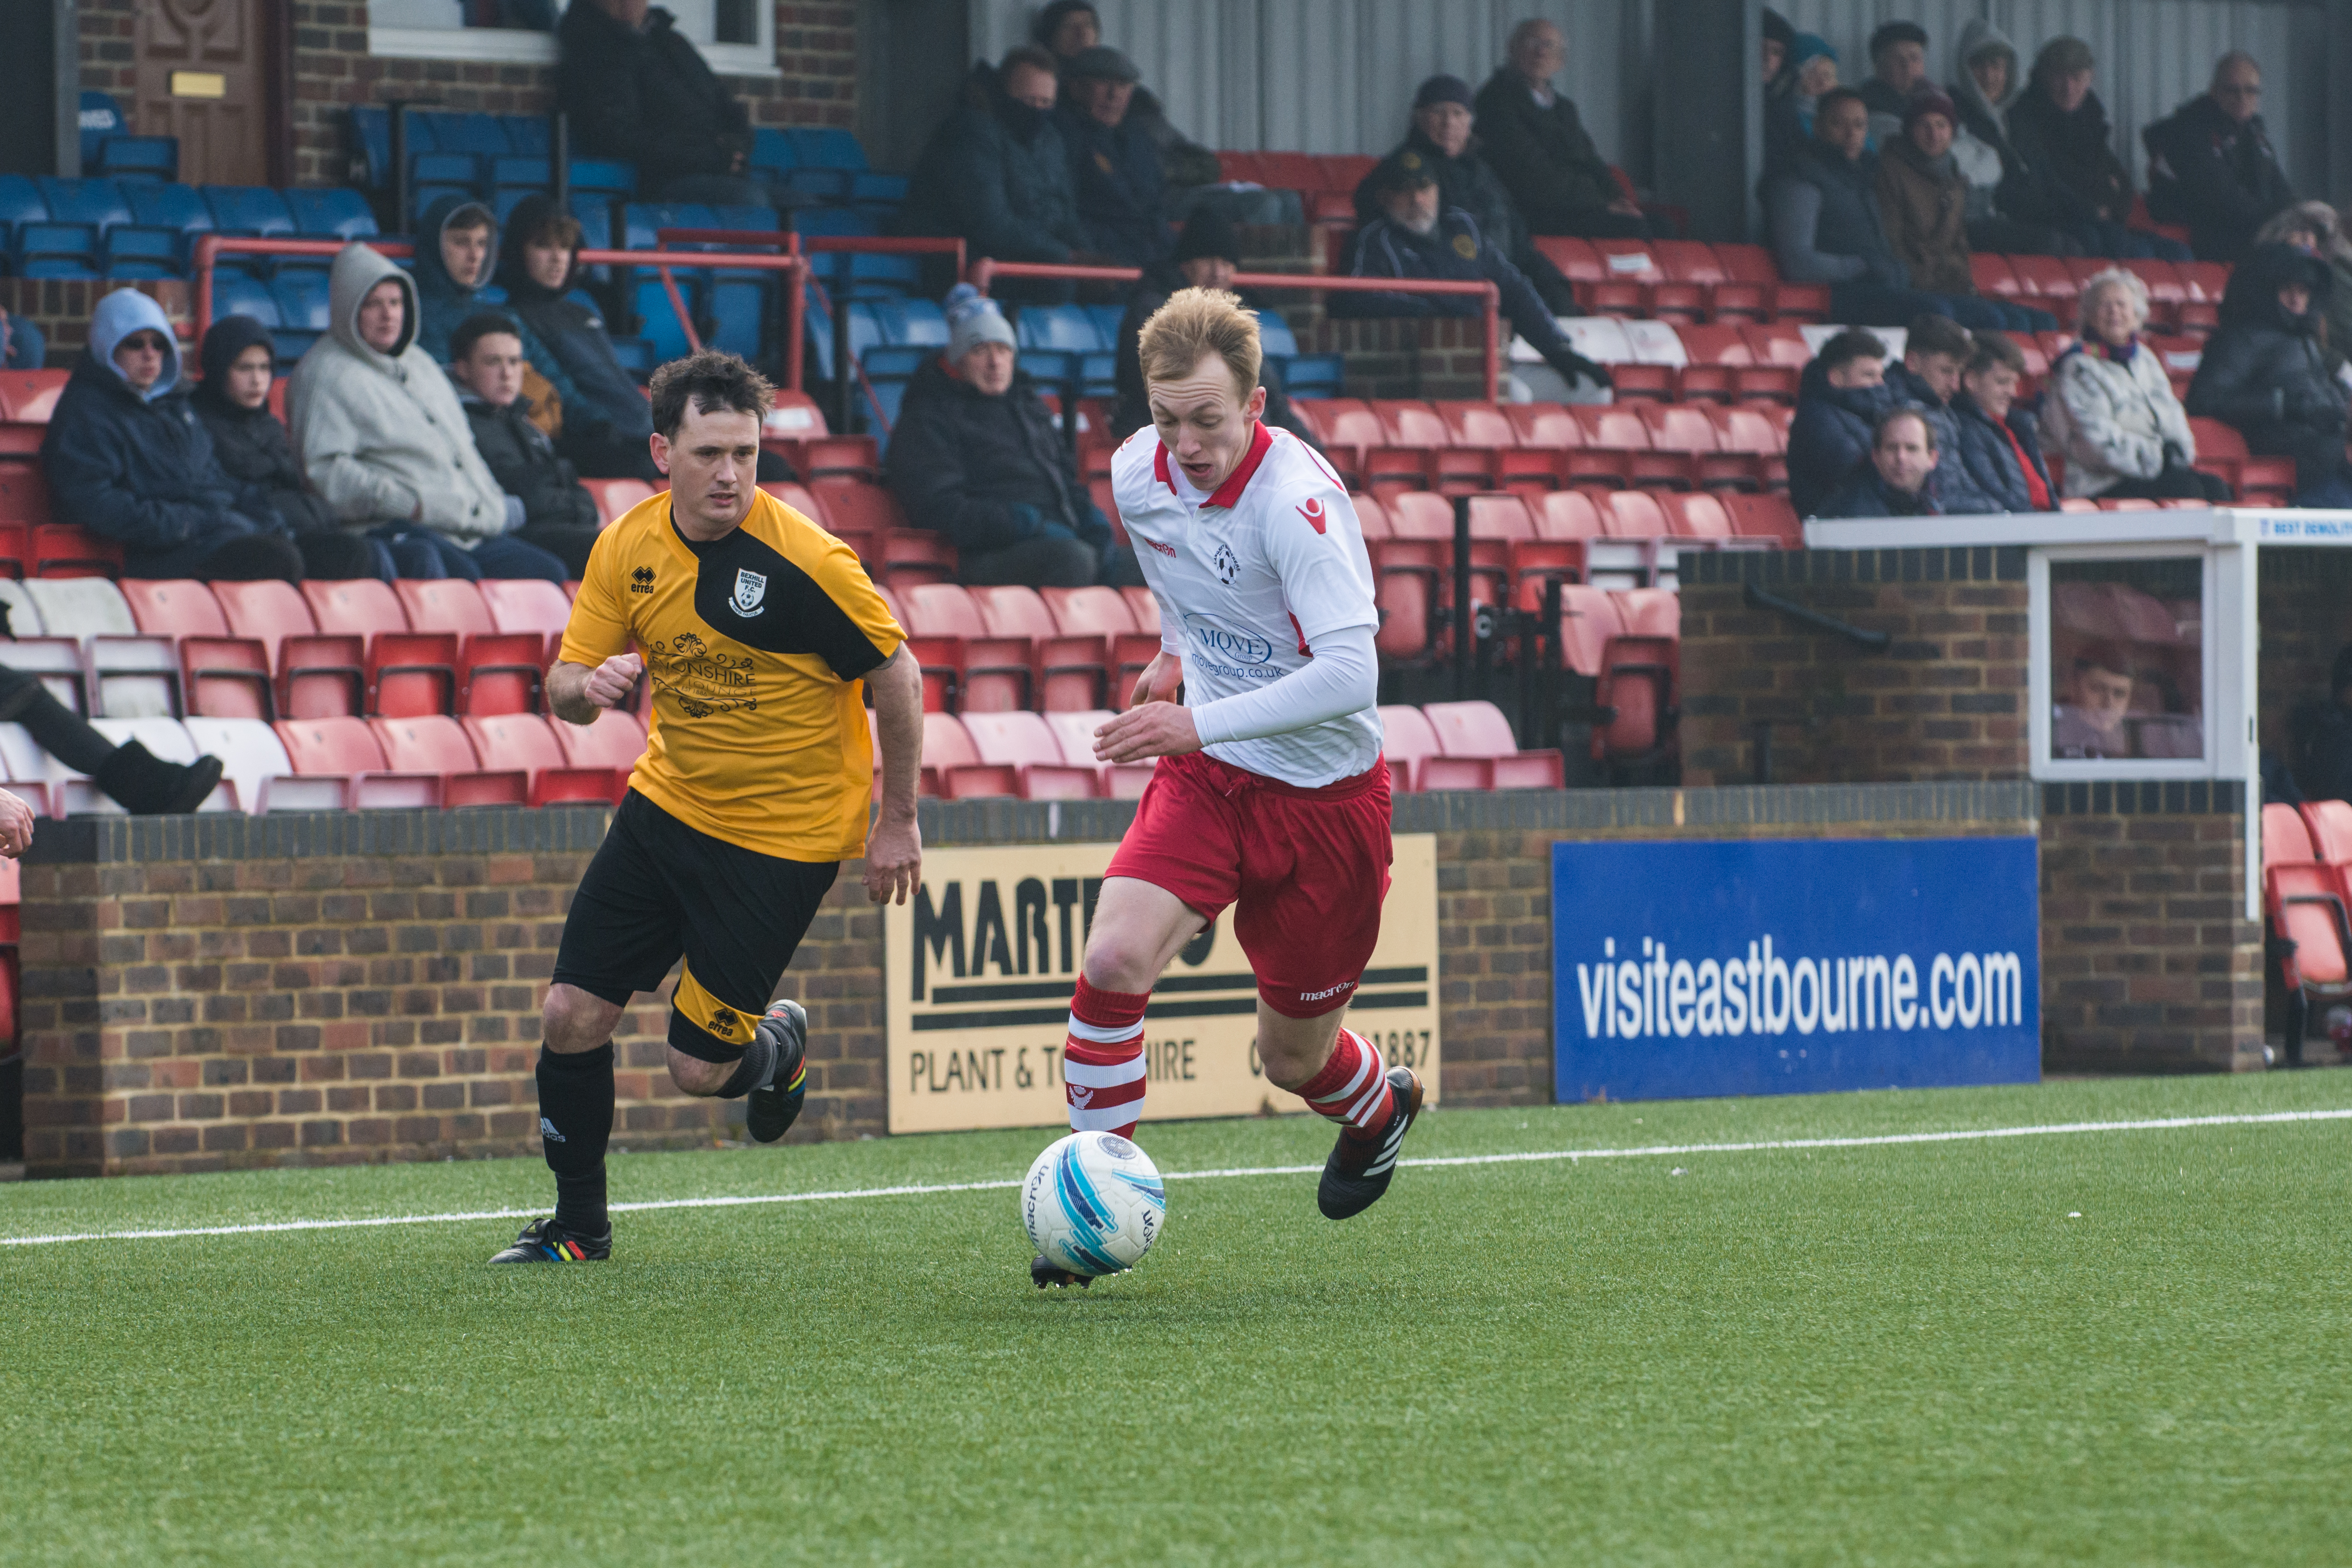 DAVID_JEFFERY Langney Wanderers FC vs Bexhill United FC 03.03.18 43